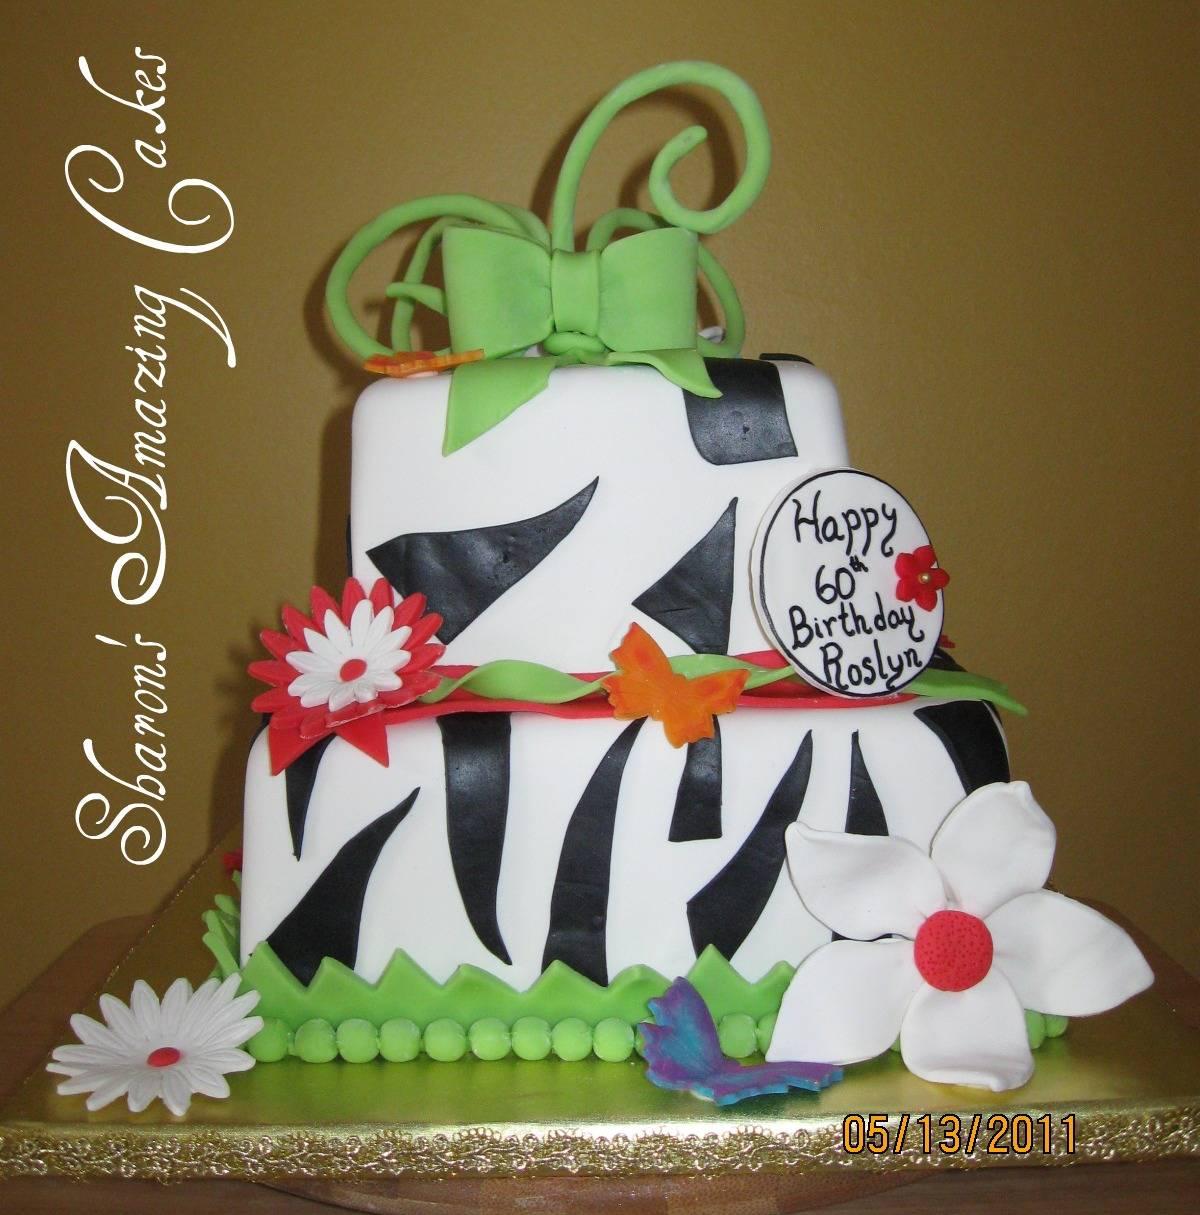 CAKE 29A1 -Daisies & Butterflies Cake